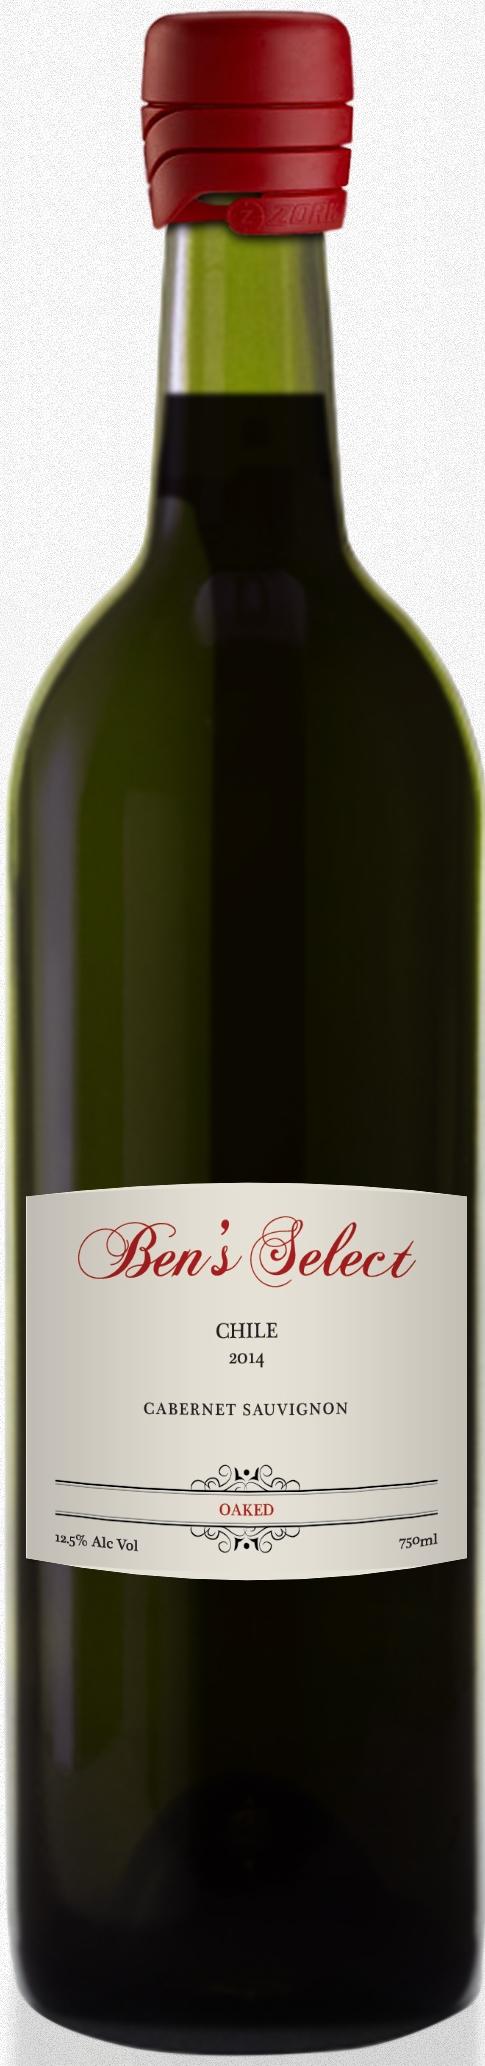 Ben's Select Cabernet Sauvignon 2014 Chile Kosher